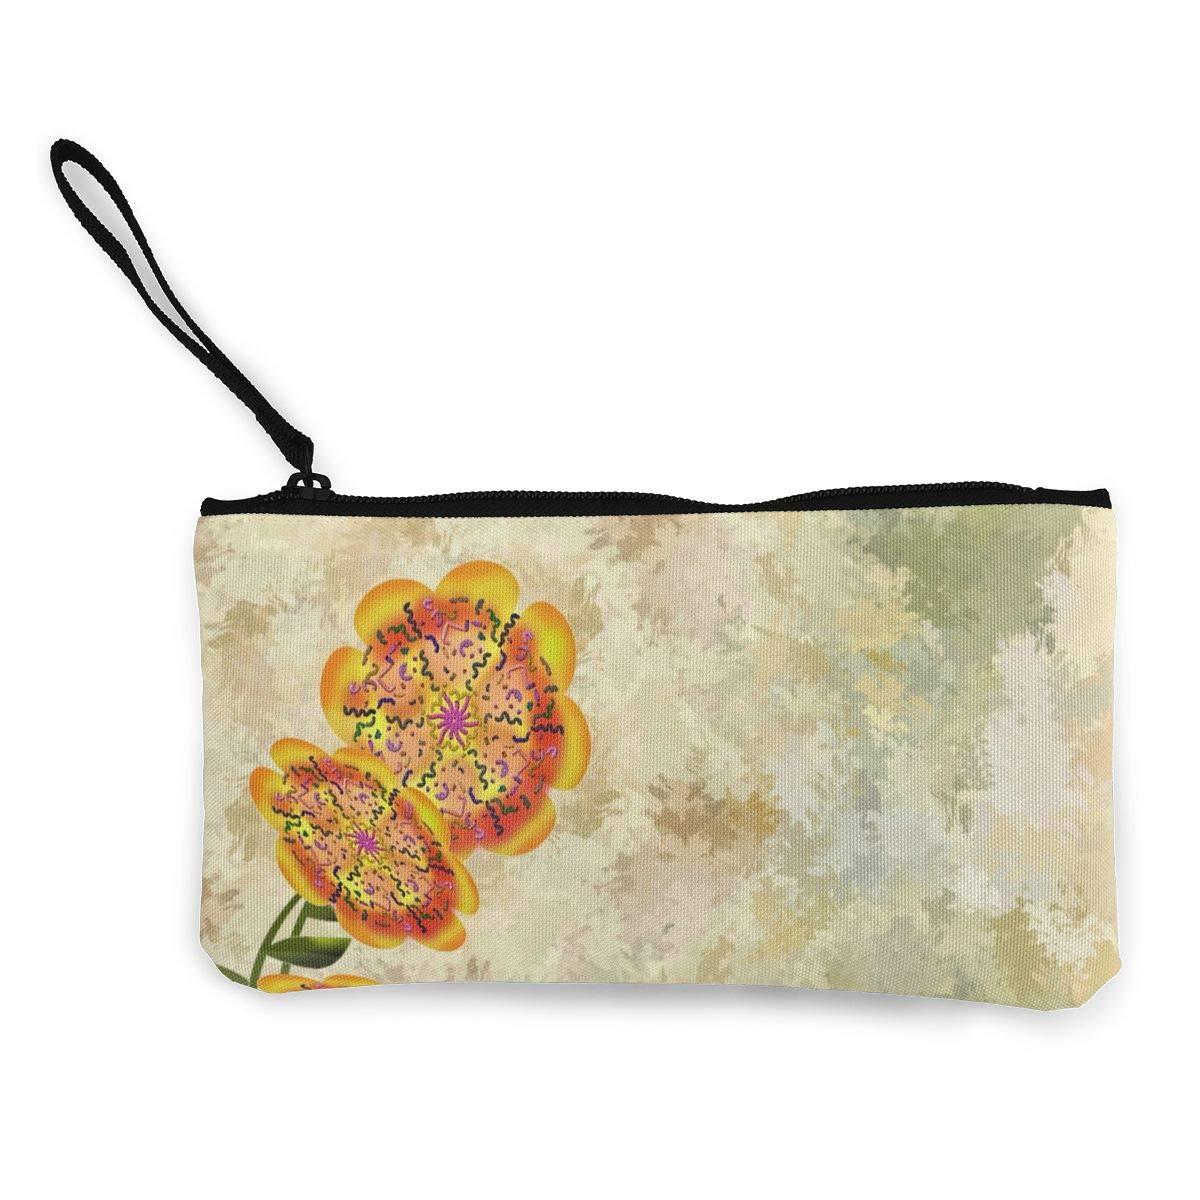 Fashion Print Coin Purse Makeup Bag Zip Canvas Purse Wallet Pocket Handbag